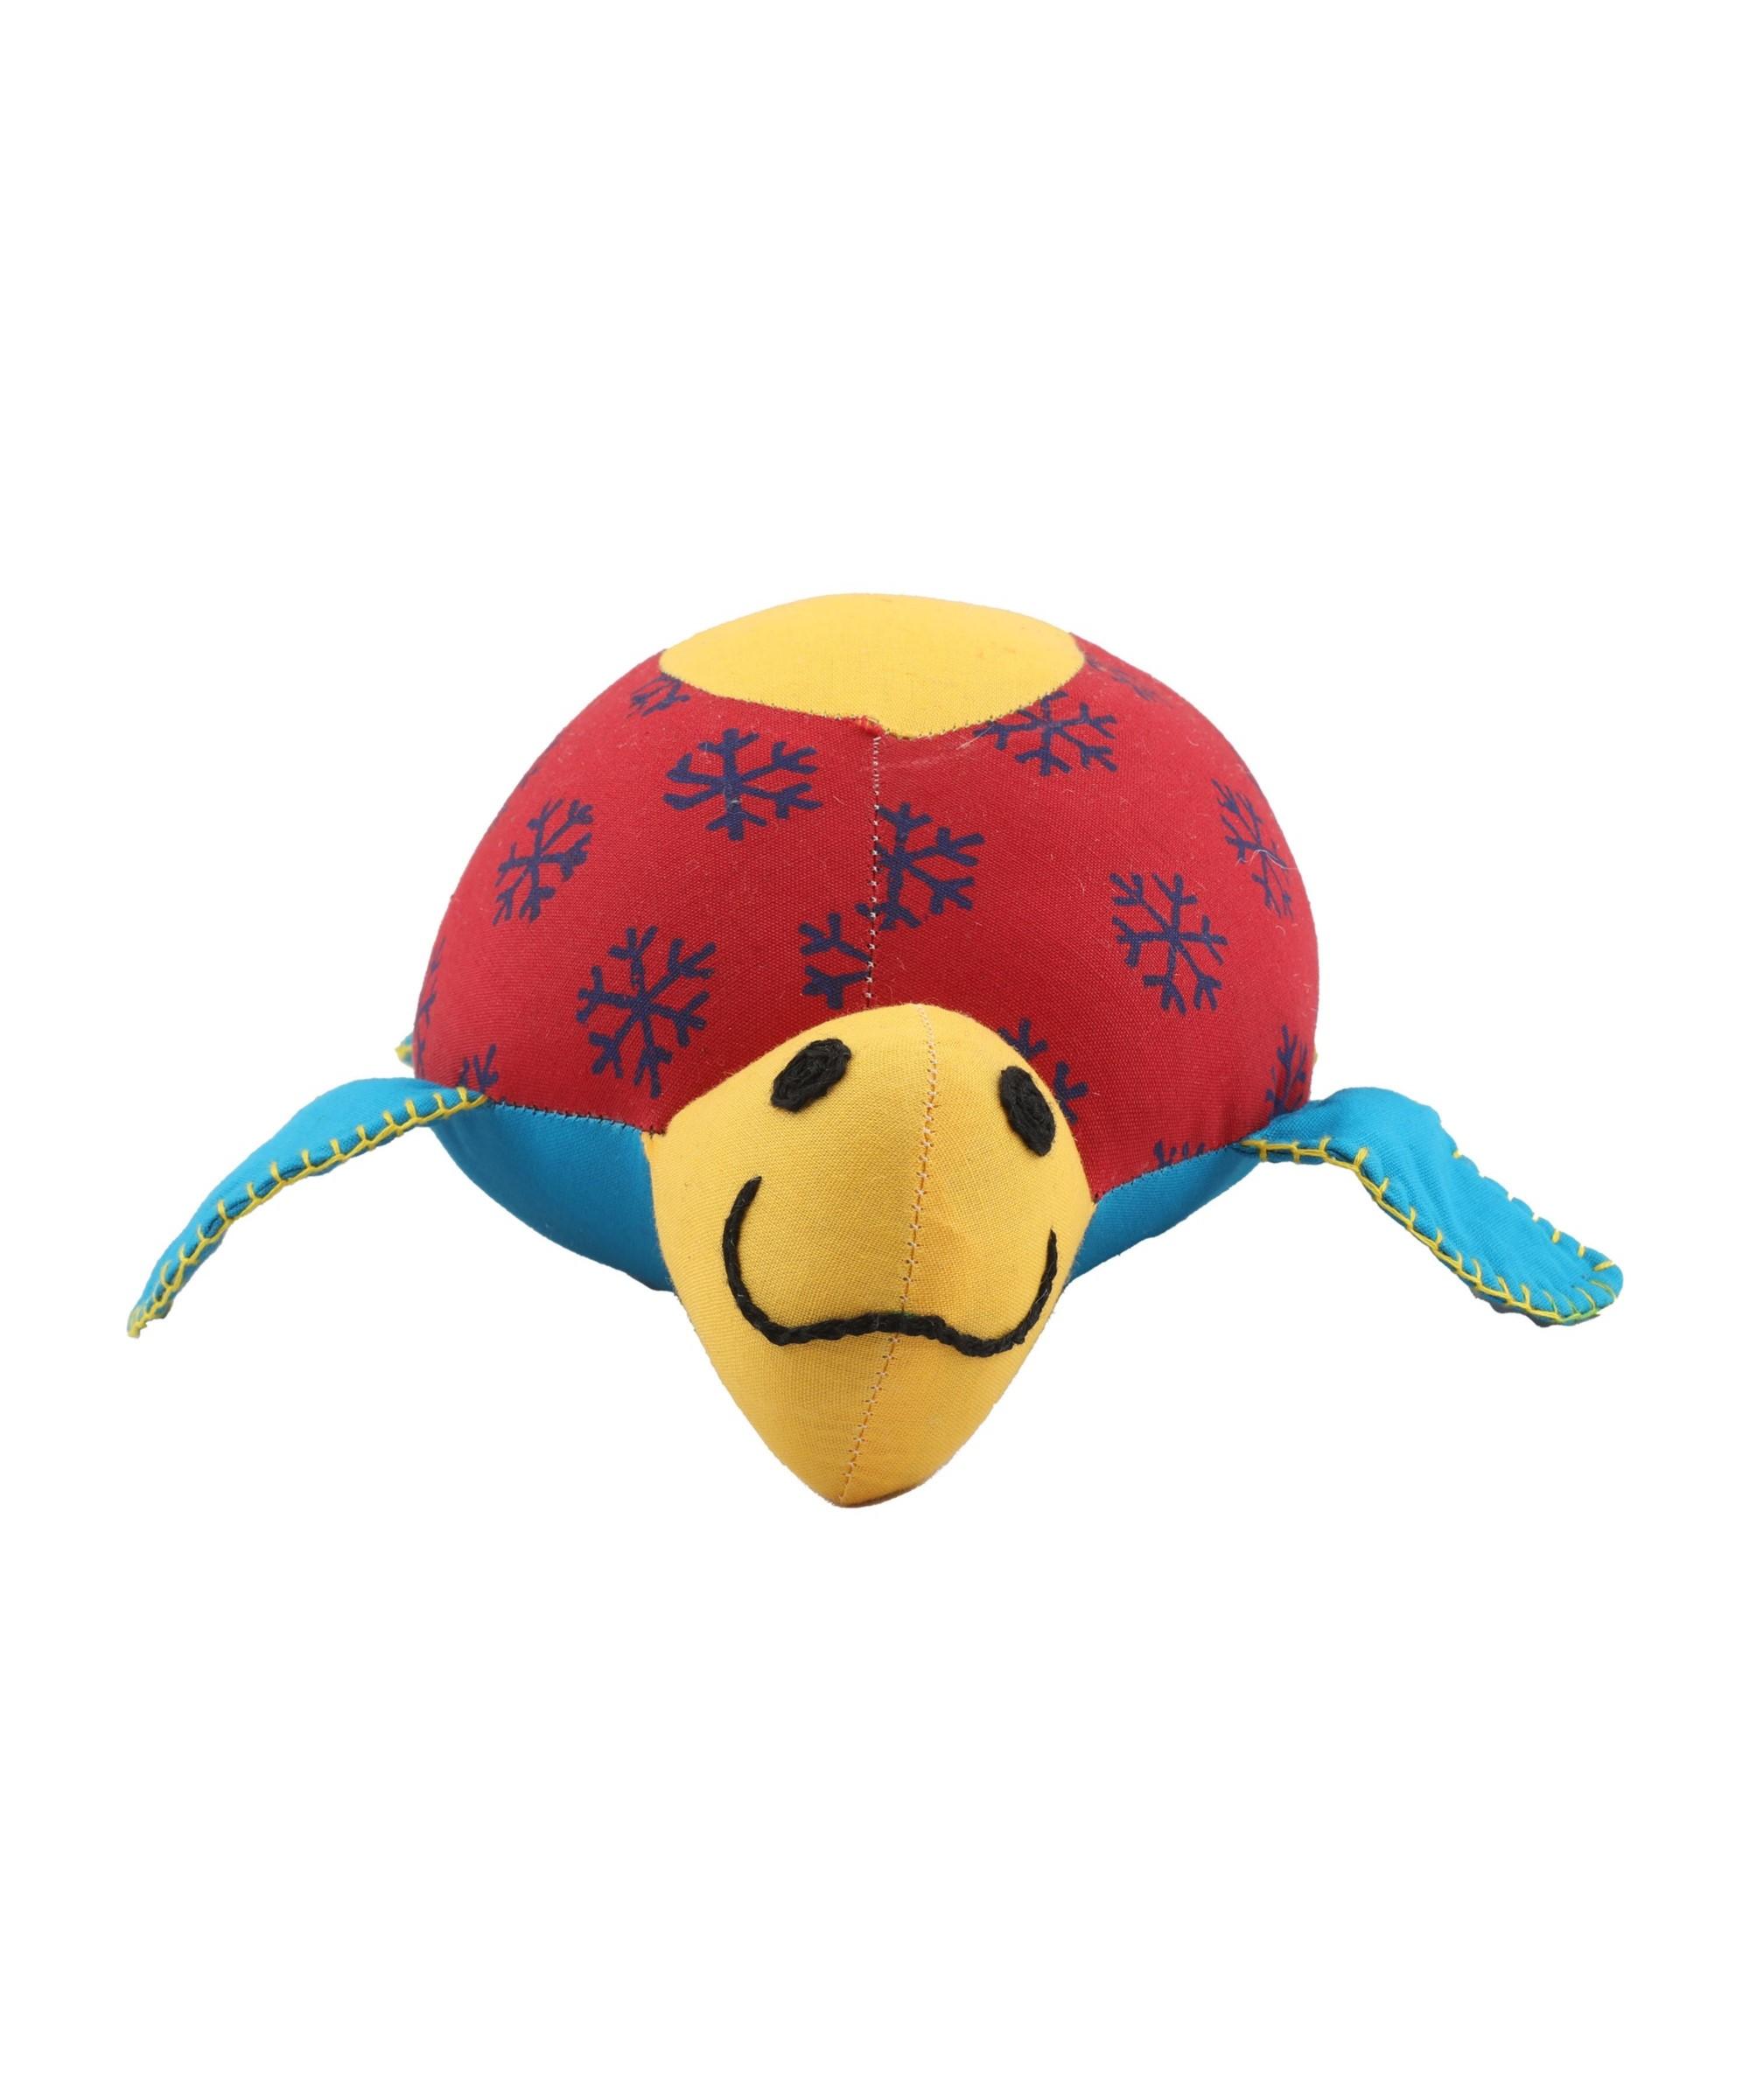 Patchwork Block Printed Soft Toy Tortoise - Big (Multicoloured) Slider Thumbnail 3/3